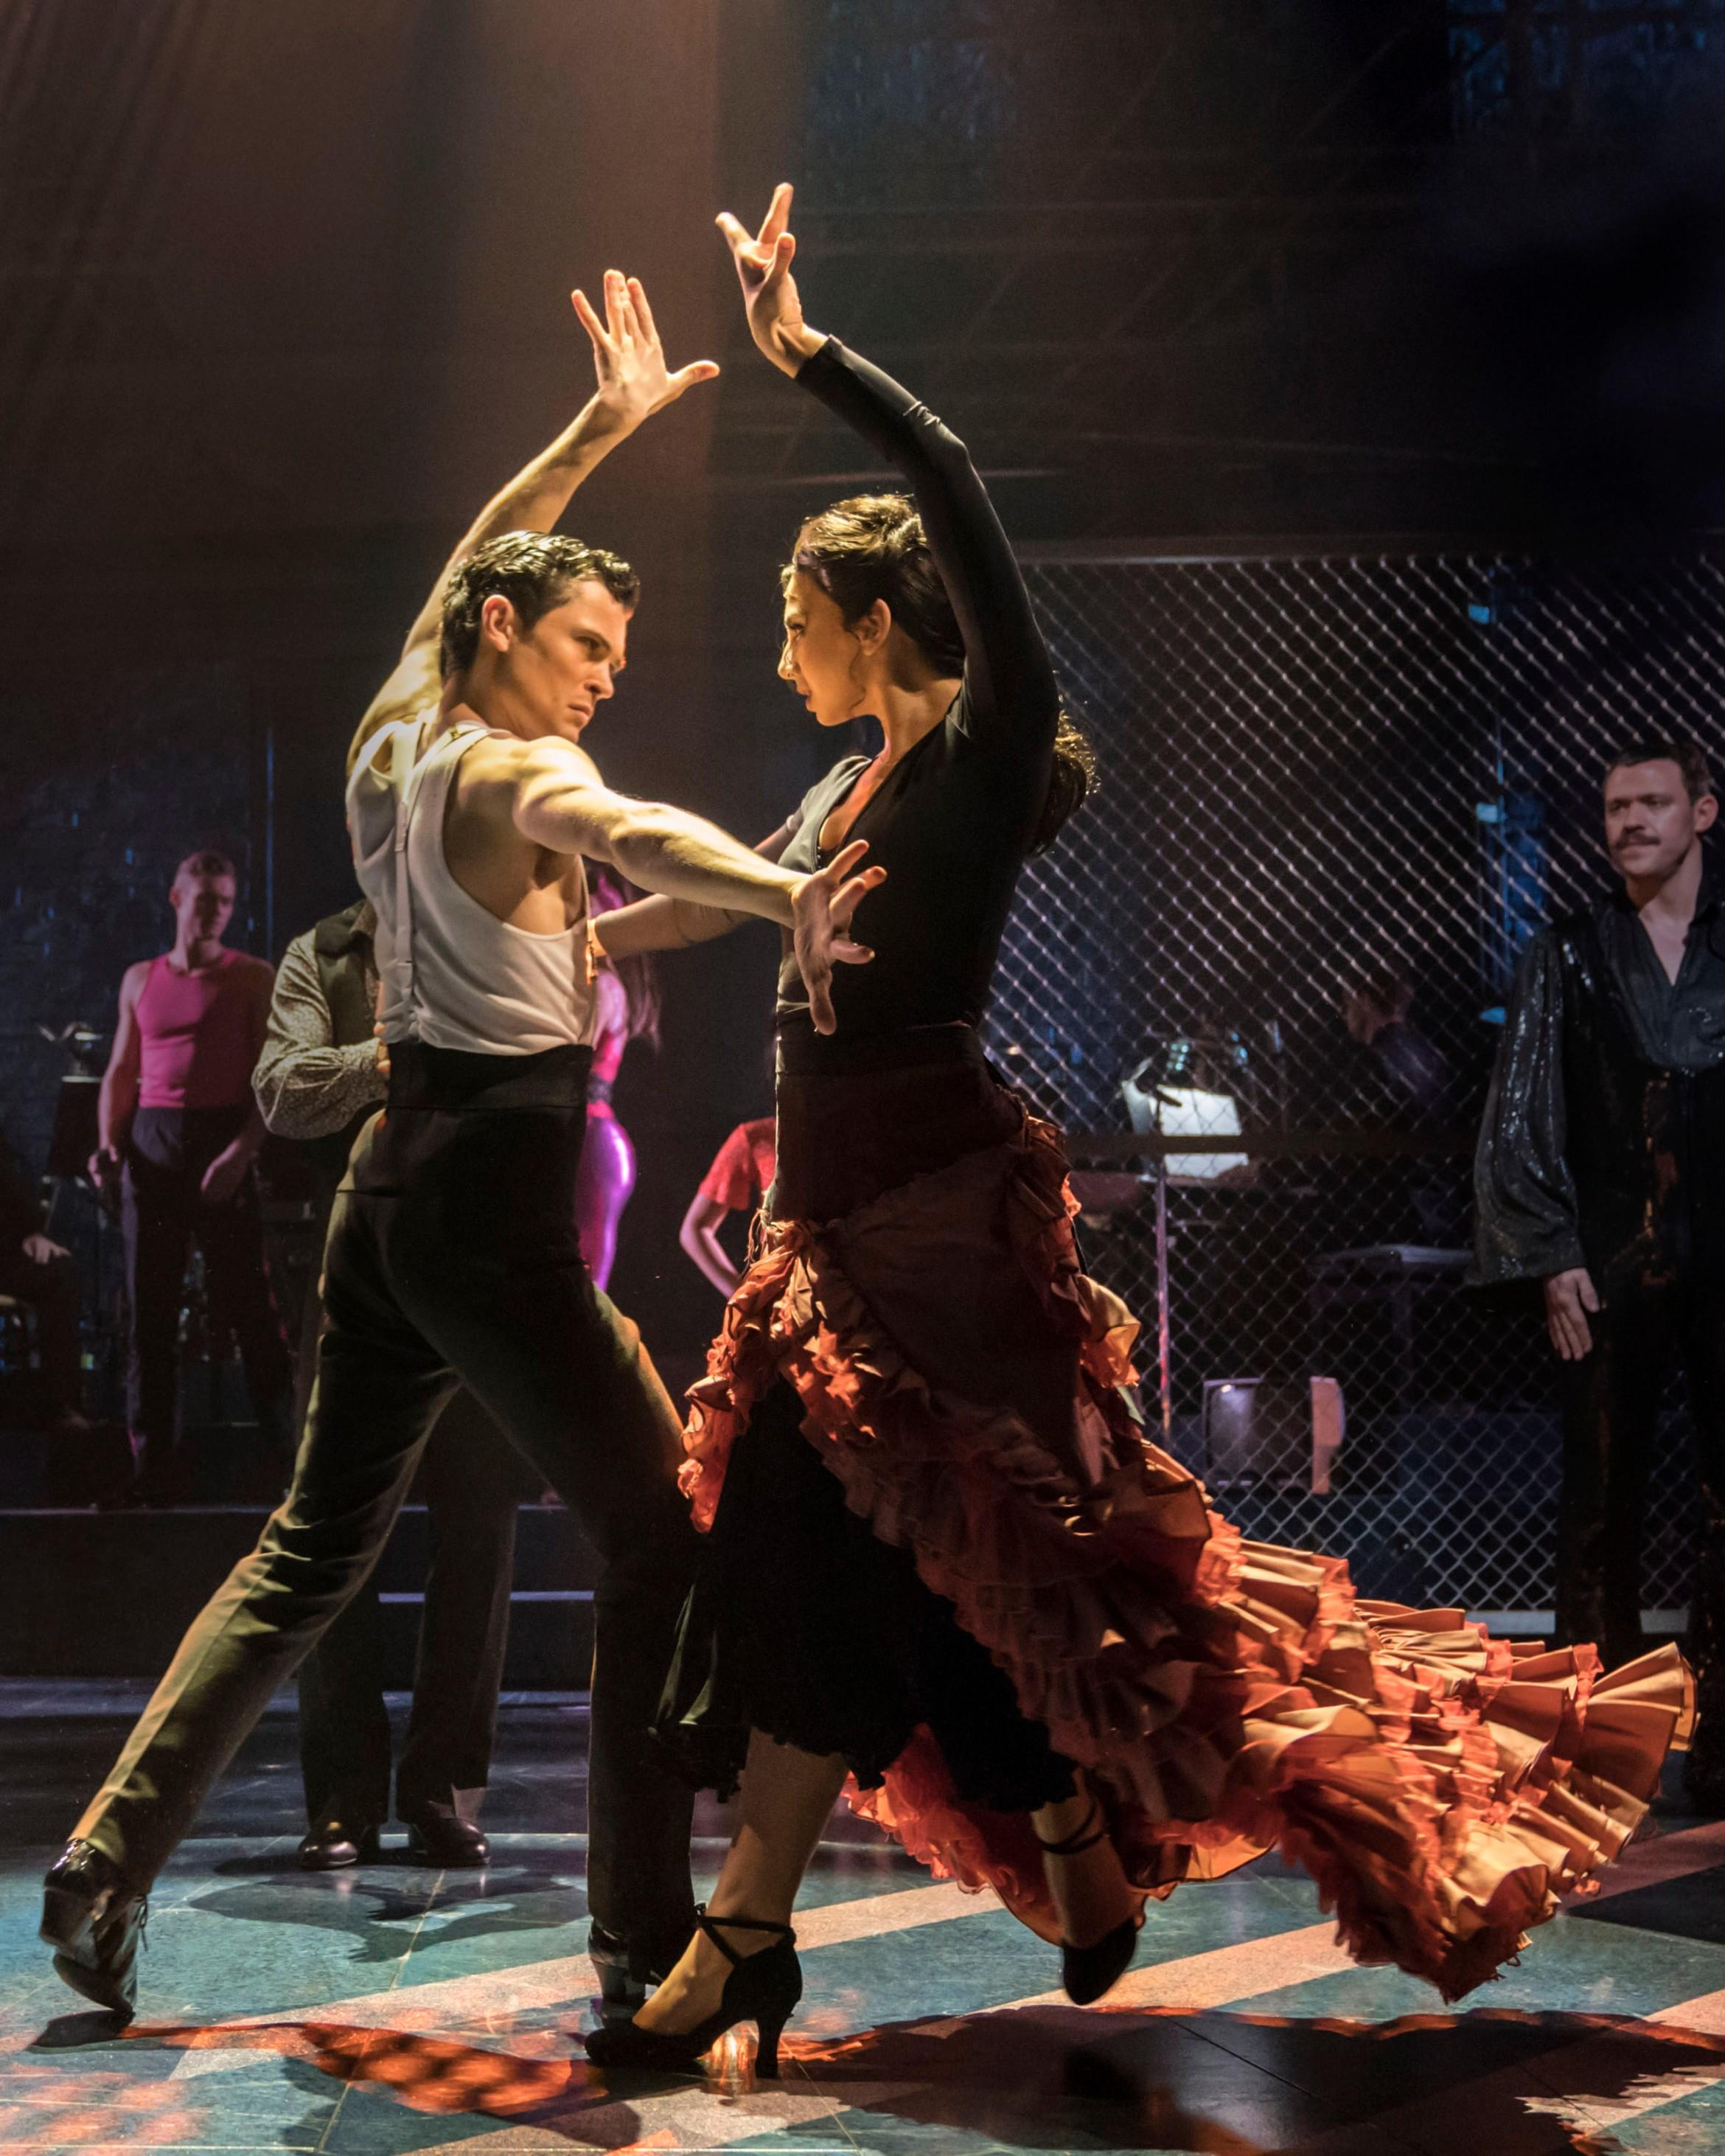 Strictly Ballroom London - Scott & Fran Paso Doble (Jonny Labey & Zizi Strallen) - photo by Johan Persson.jpg